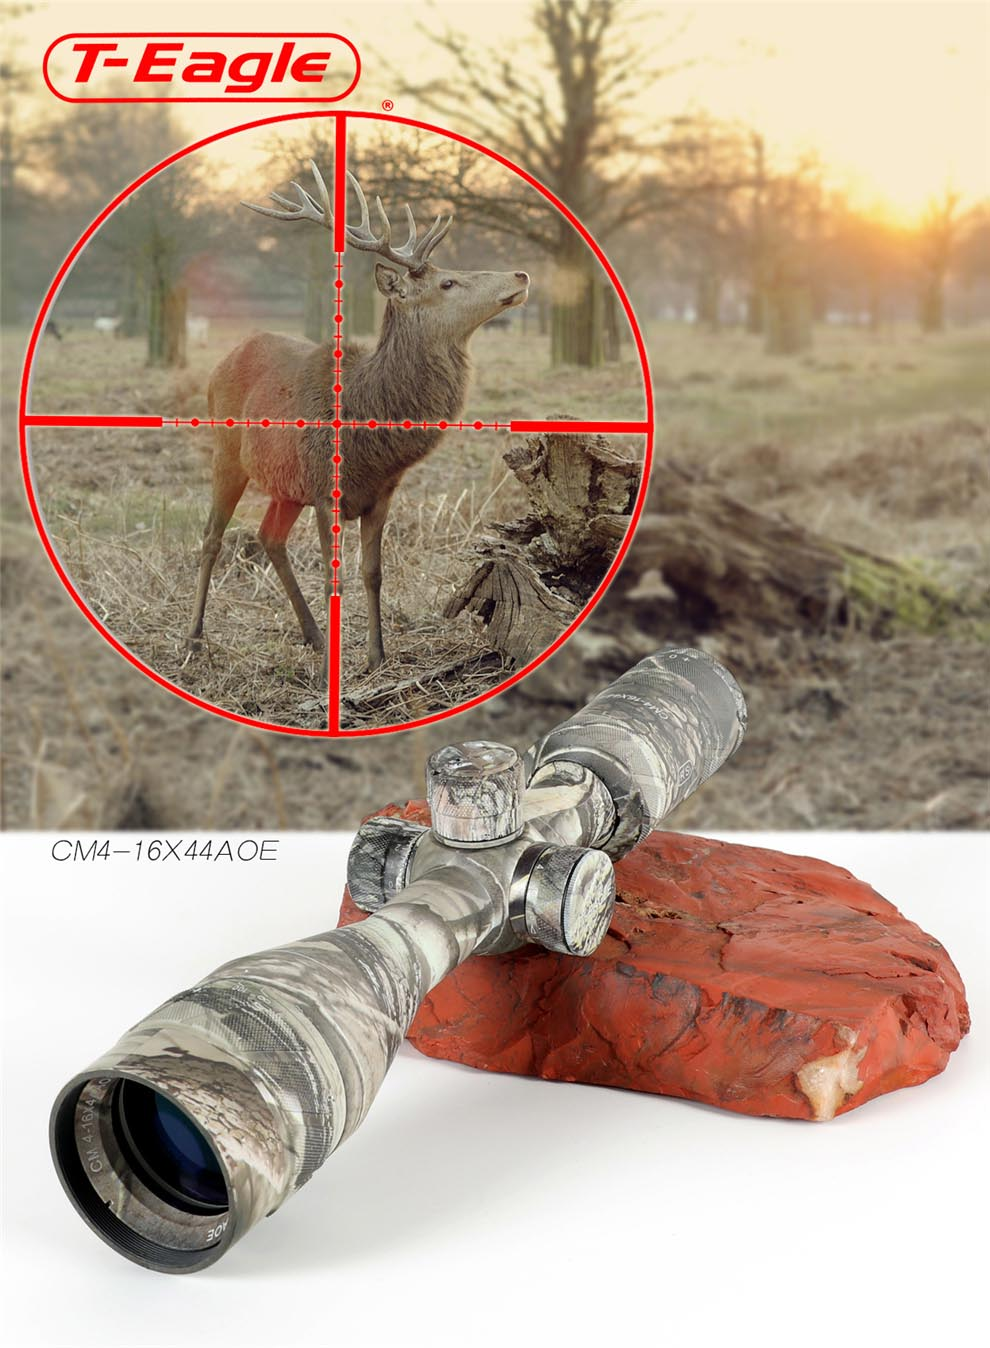 Tactical Riflescope pic -1